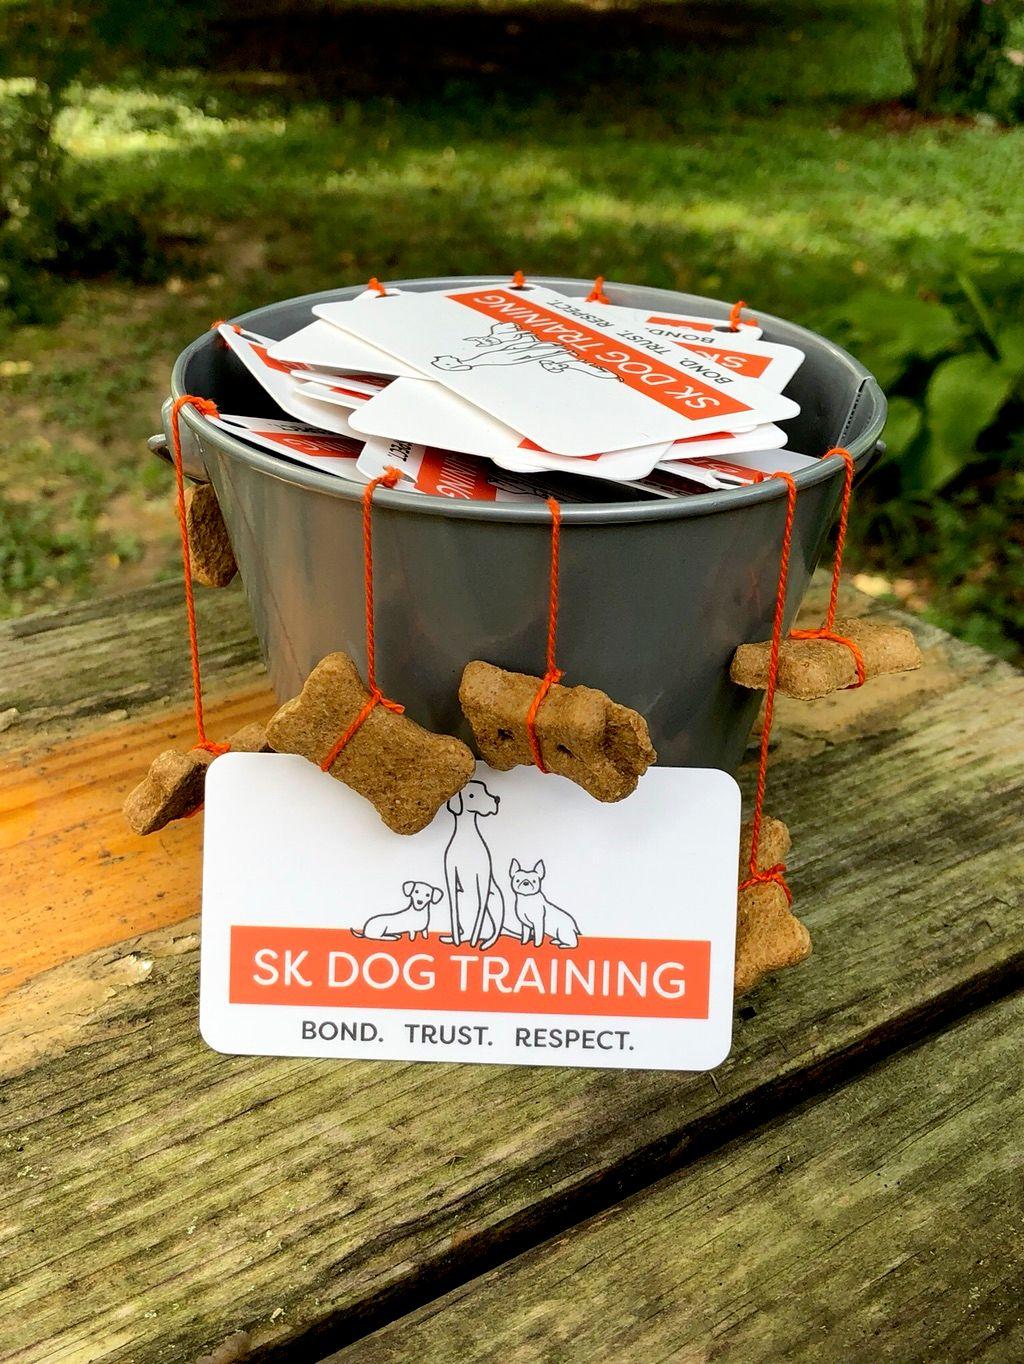 SK Dog Training